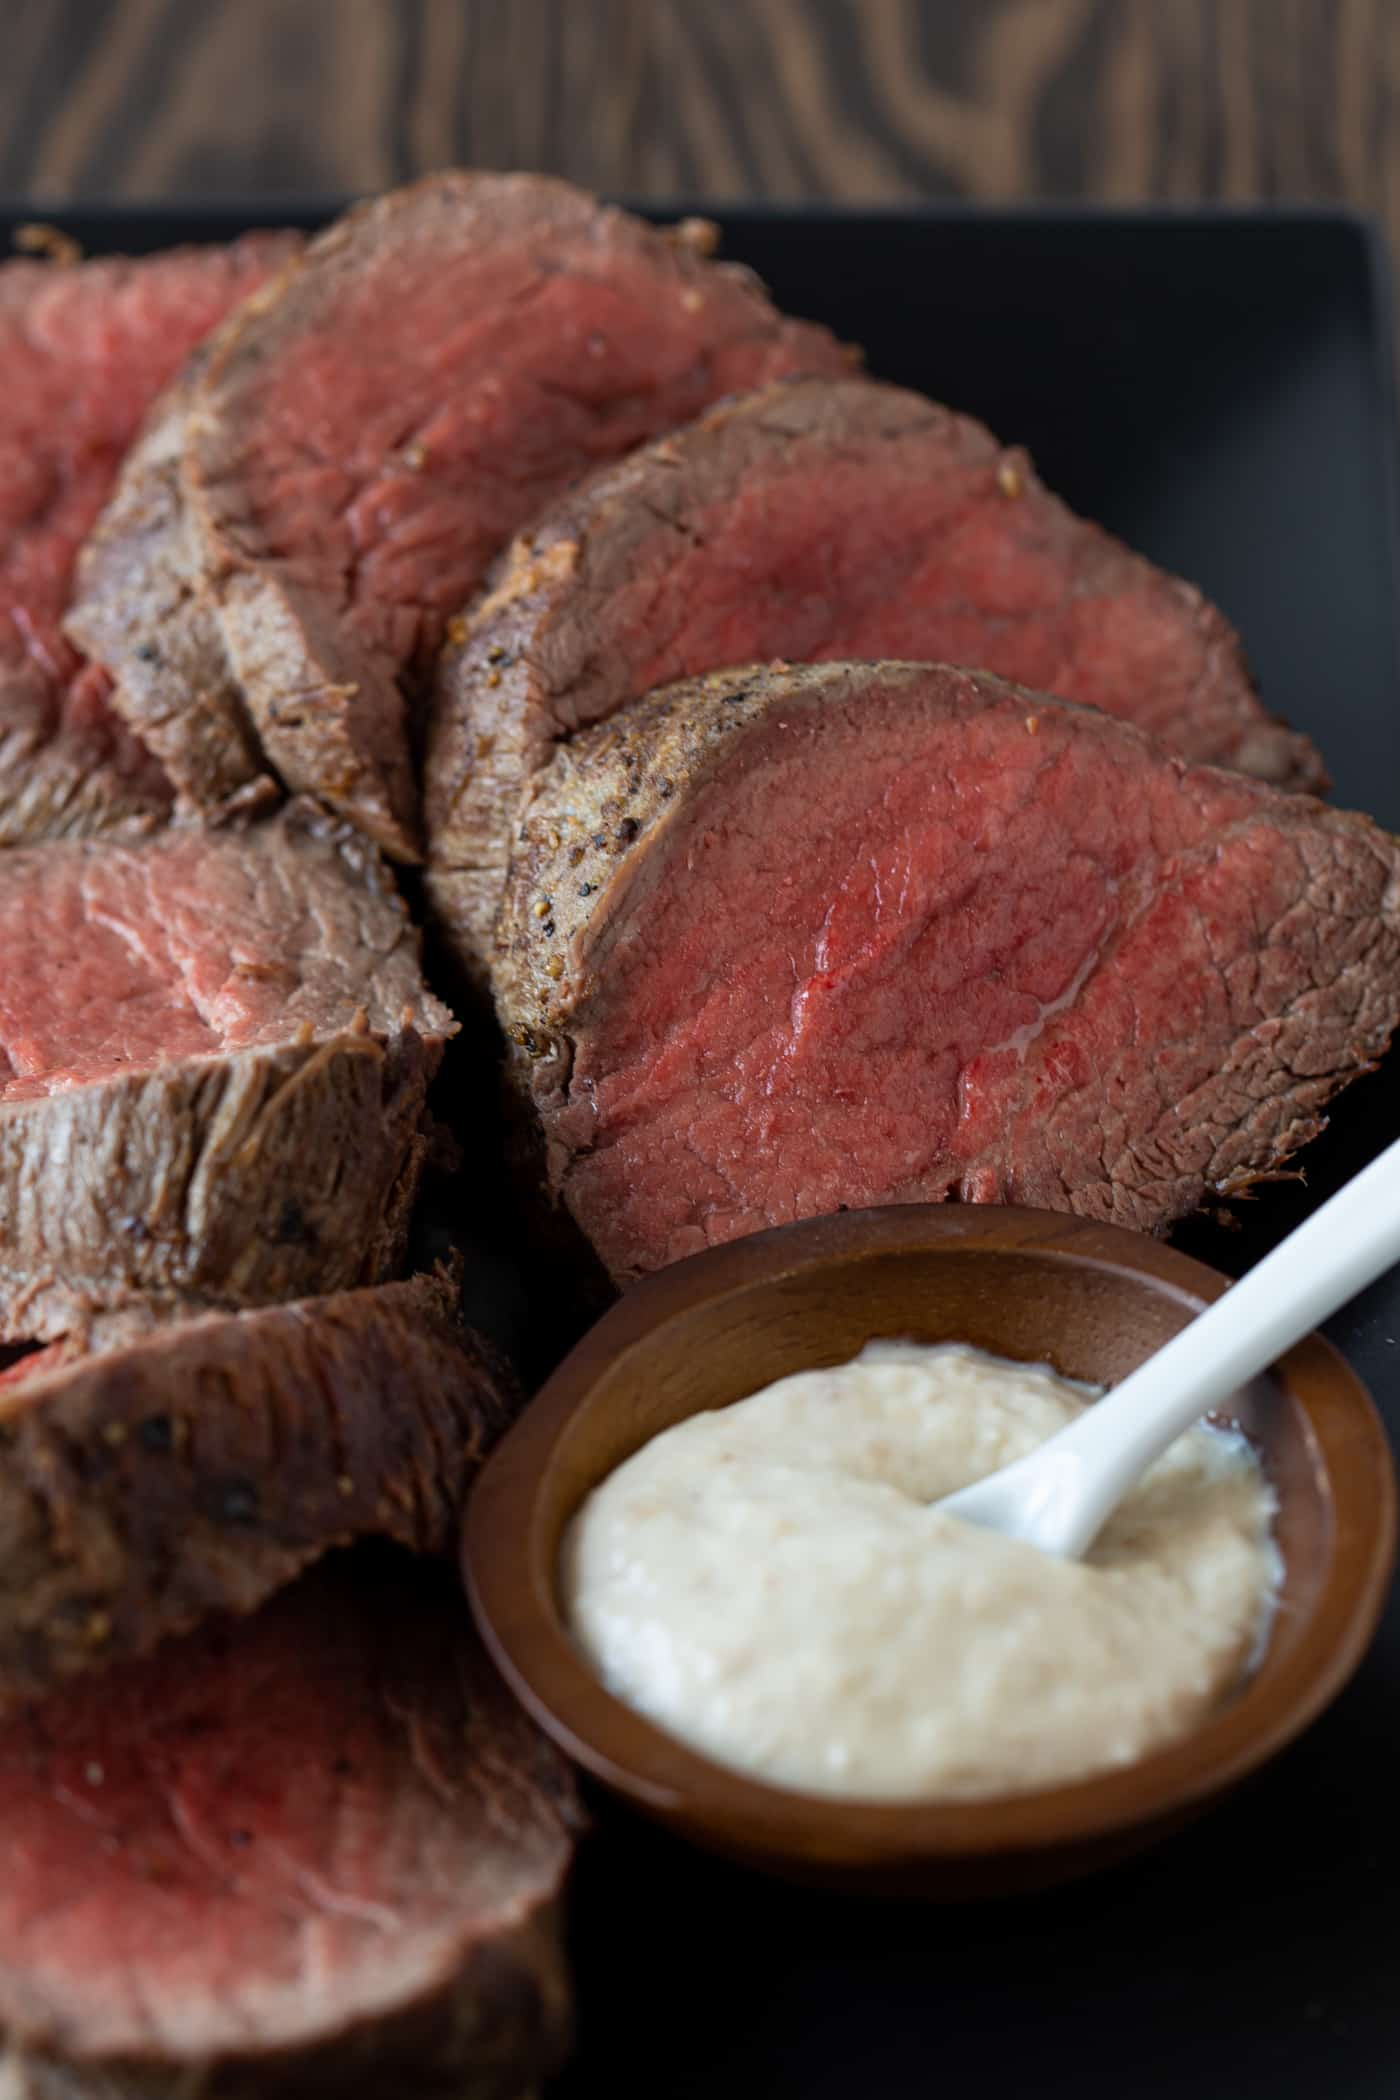 sliced beef tenderloin on platter with horseradish sauce.